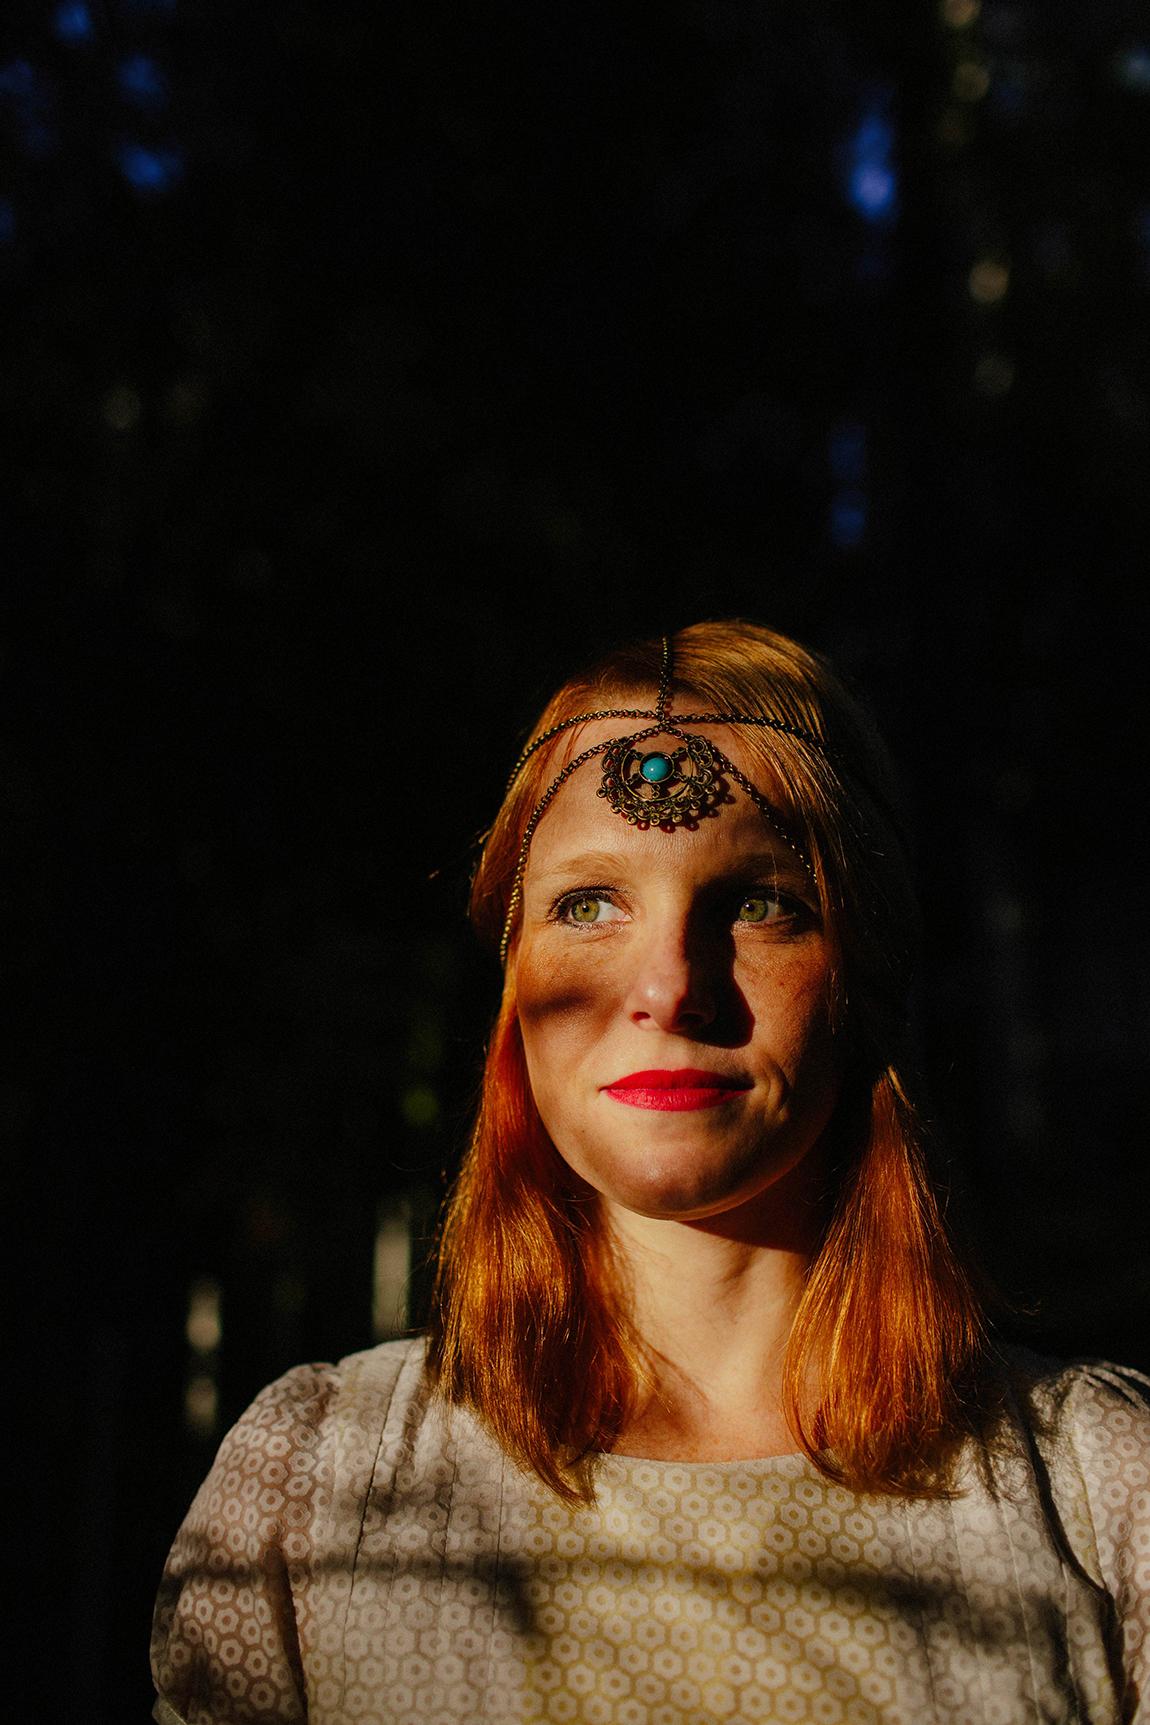 mariana-alves-fotografia-curitiba-ensaio-camila-noiva (9)10